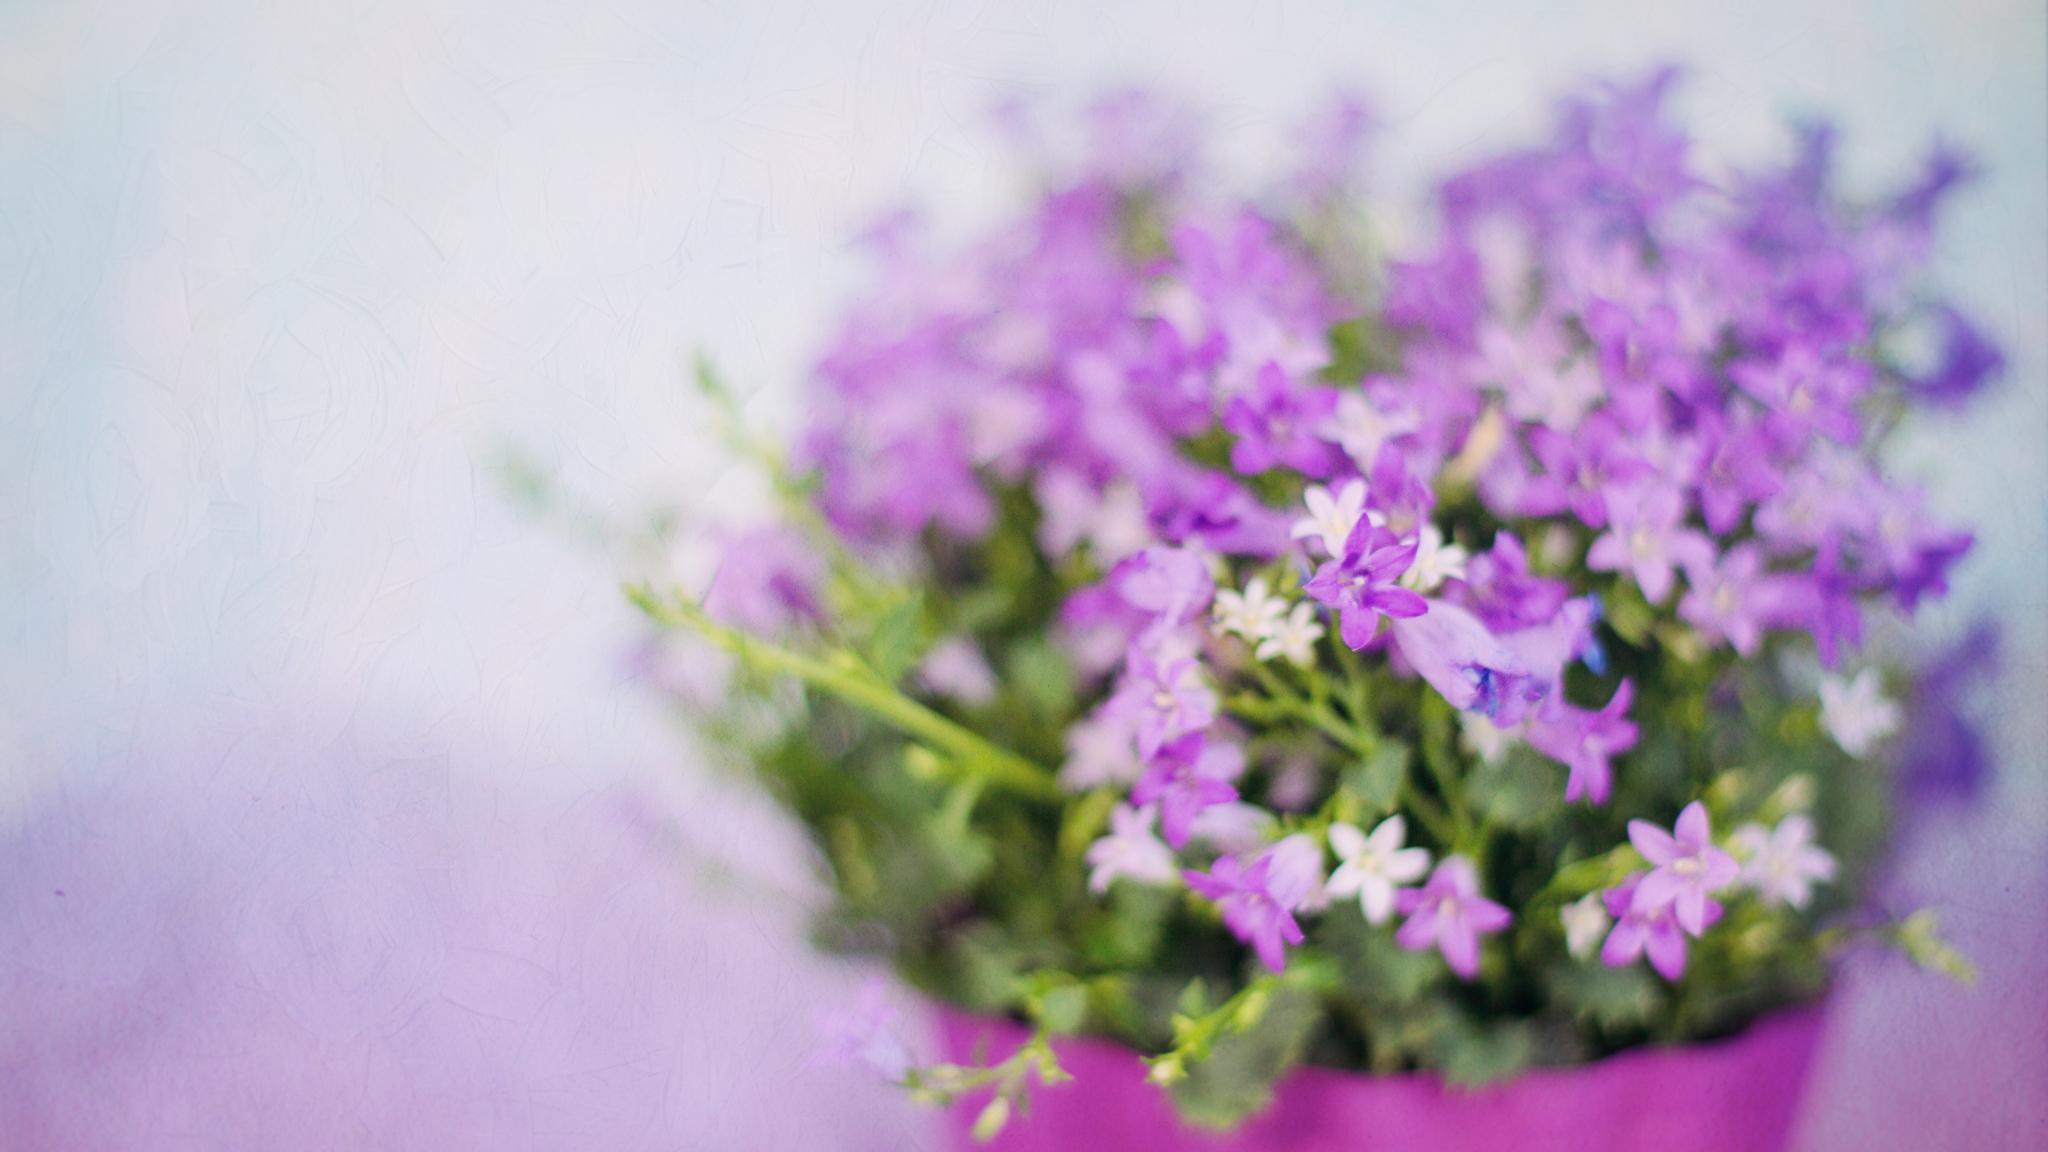 Download 2048x1152 Wallpaper Small Purple Flowers Blur Vase Dual